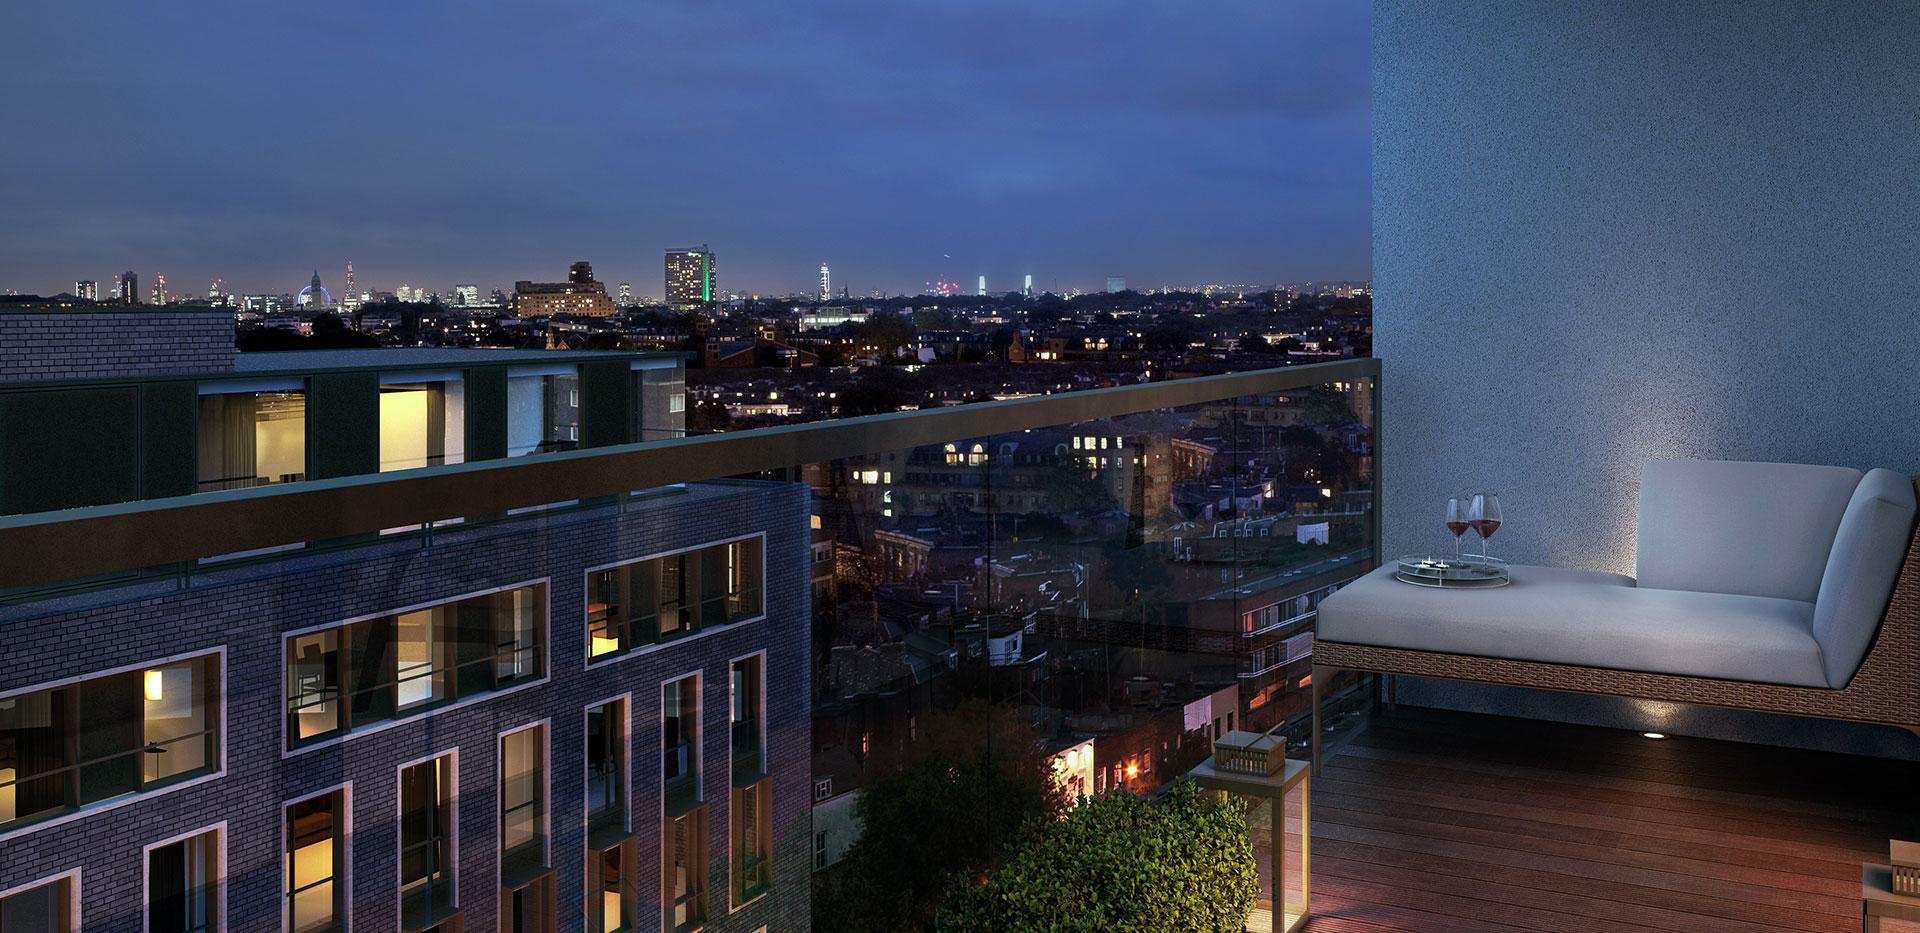 St Edwards, Kensington Row, Mowbray House, Lobby CGI